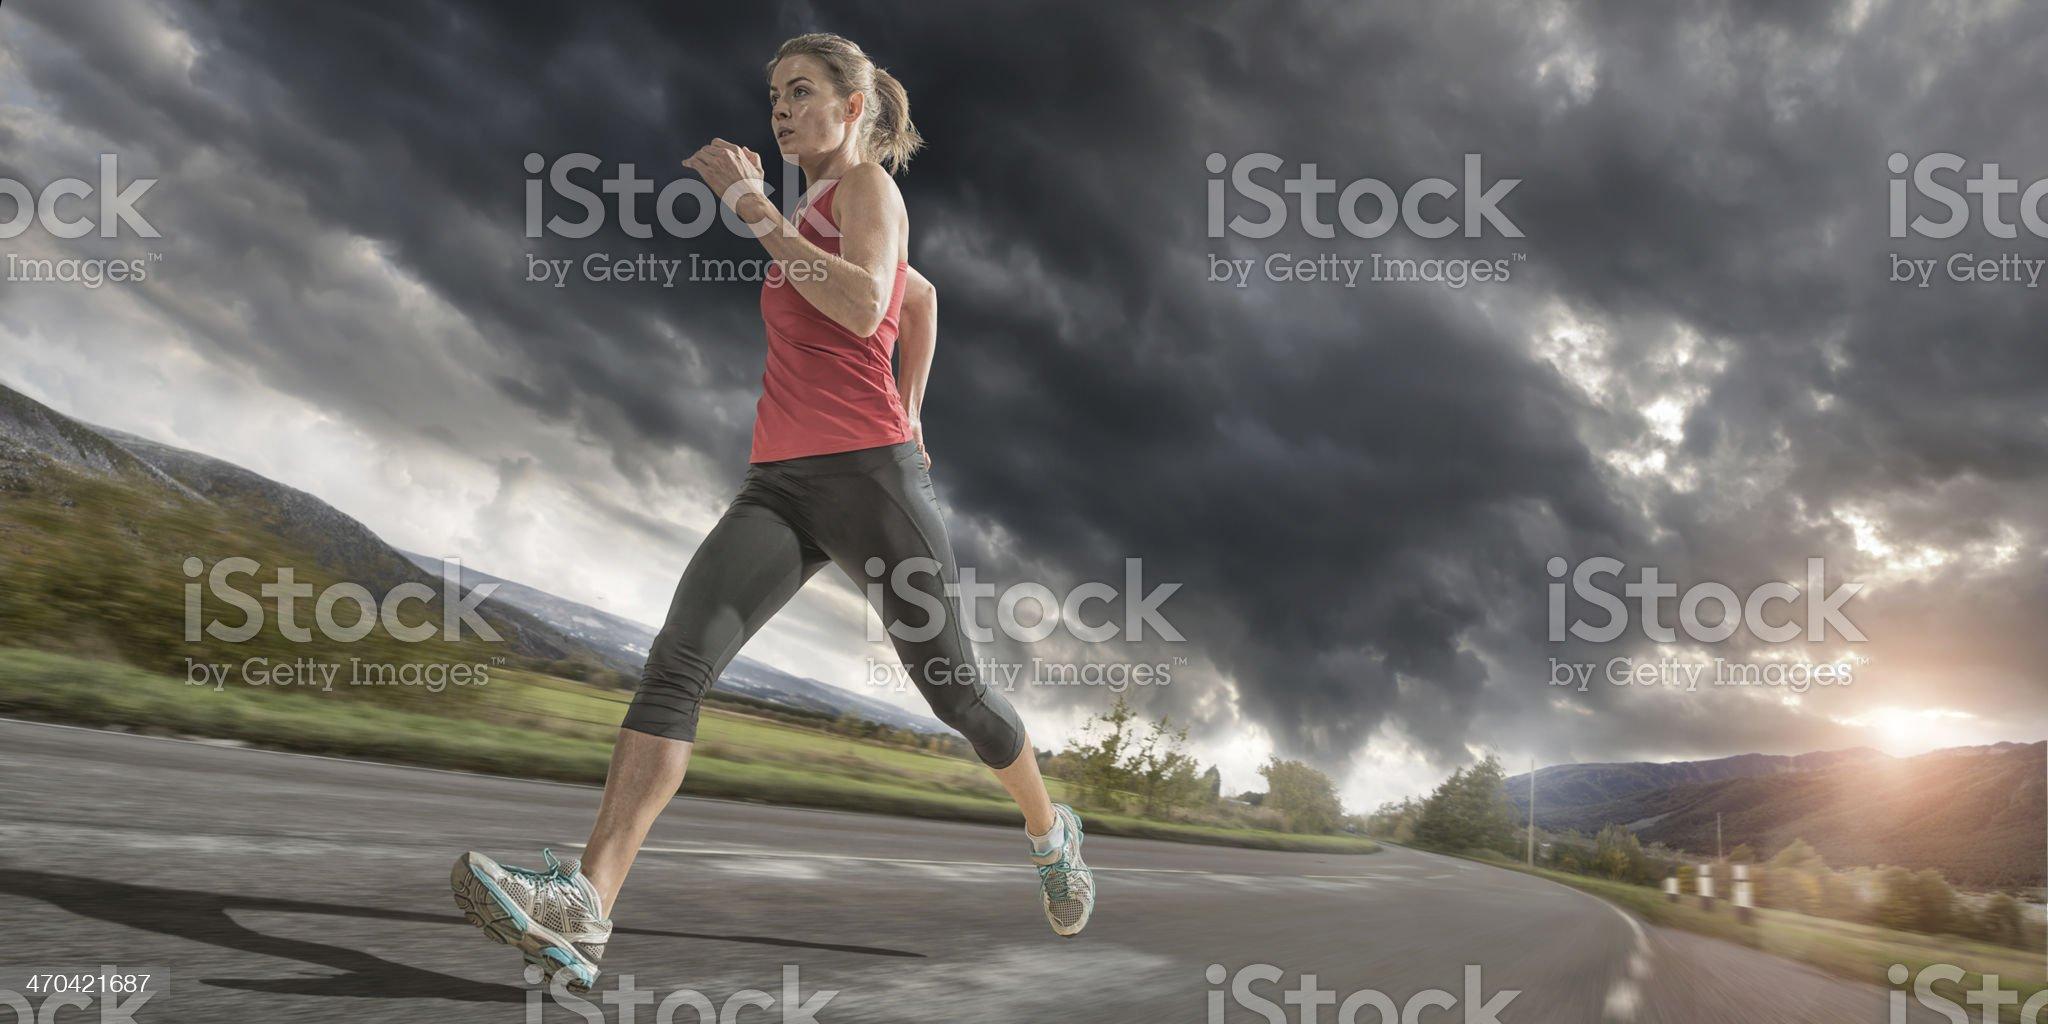 Evening Run Under Stormy Sky royalty-free stock photo